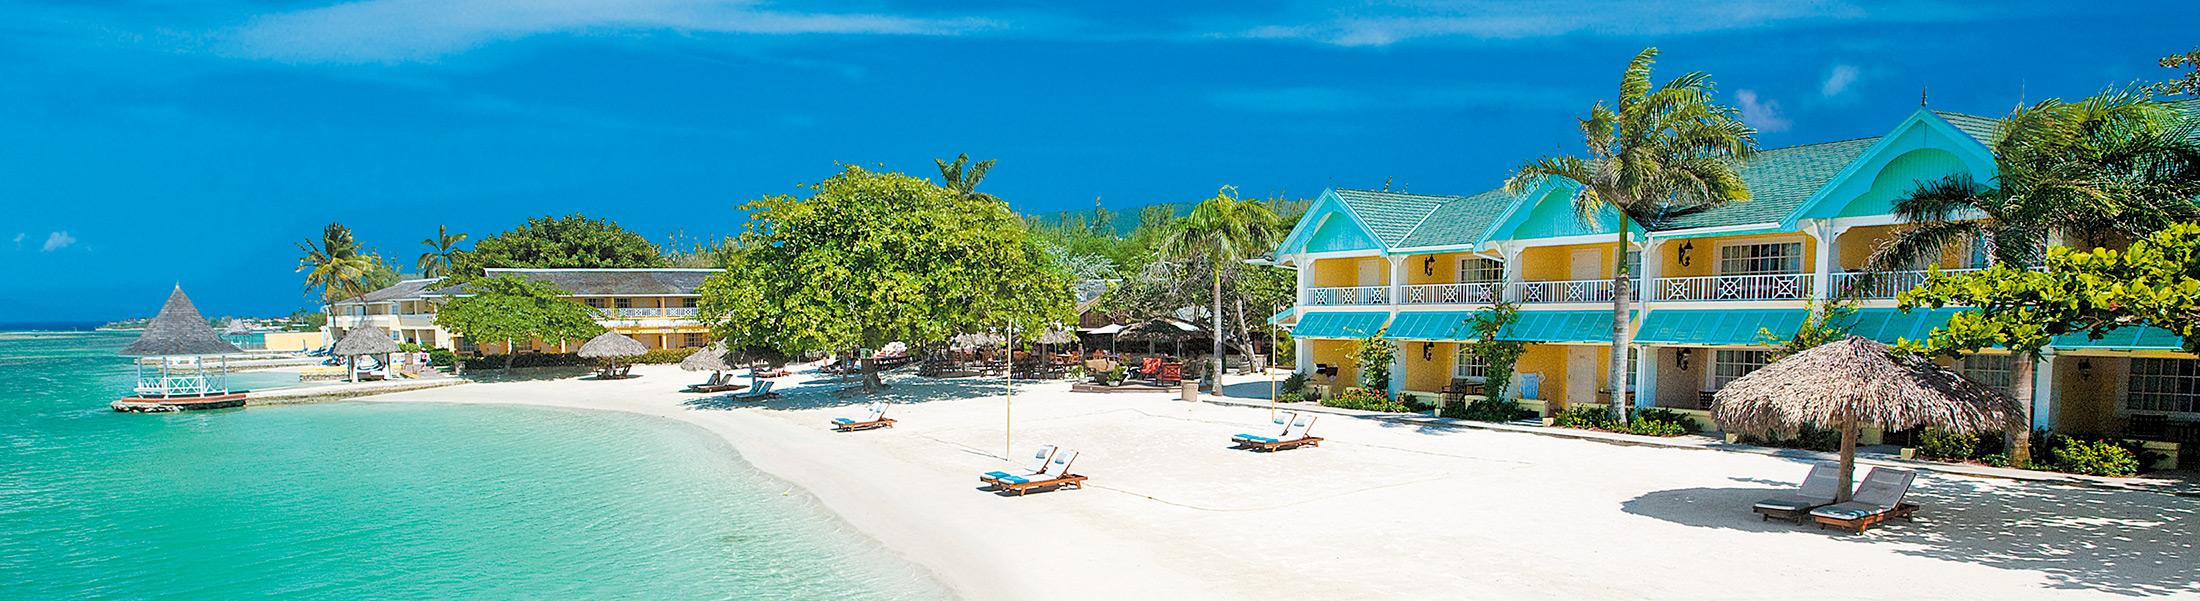 White sand beacy at Sandals Royal Caribbean